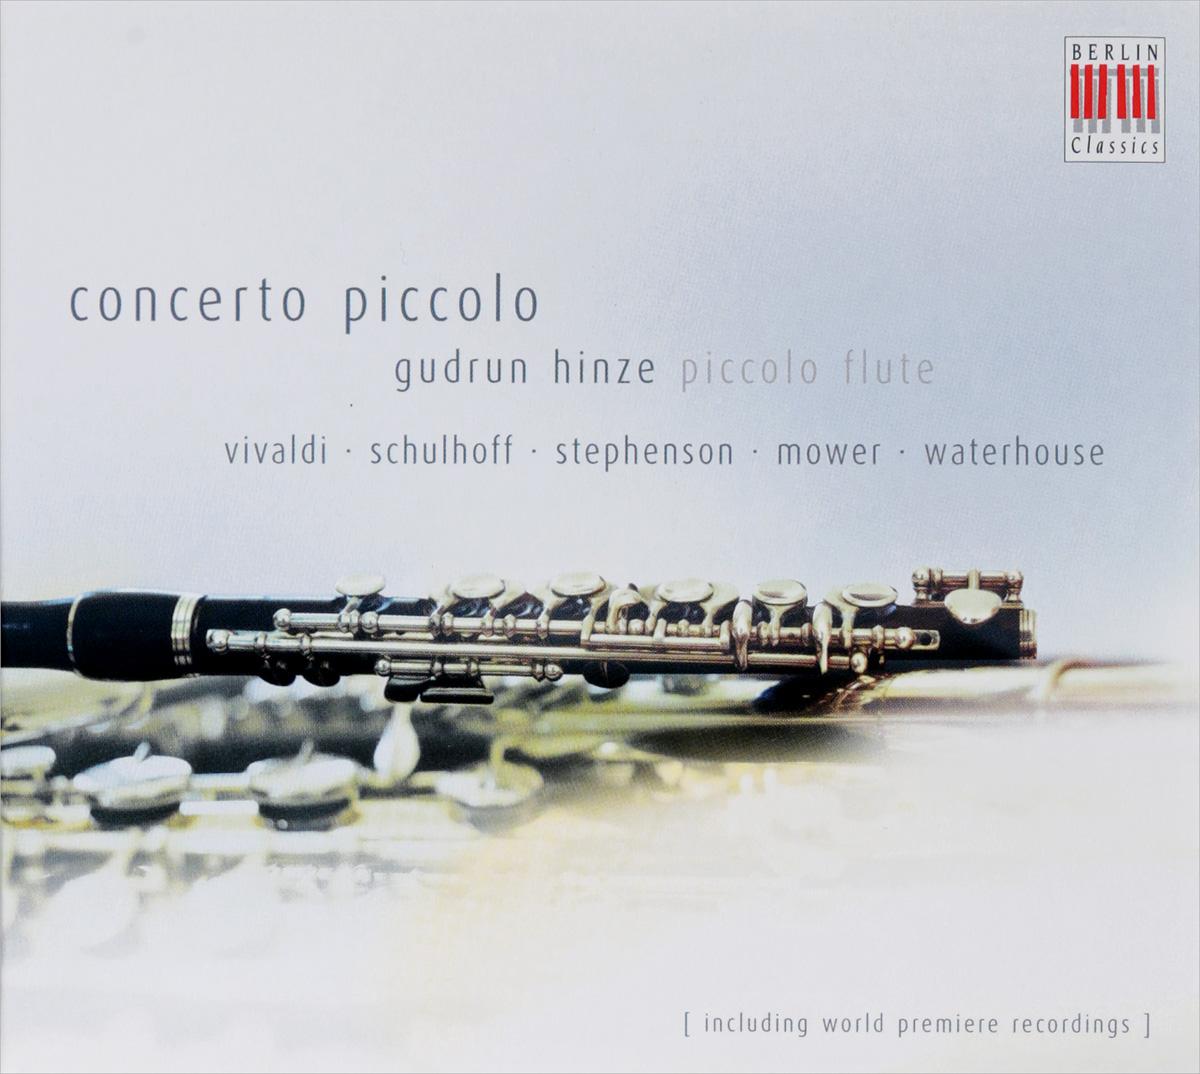 Gewandhausorchester Leipzig Gudrun Hinze Piccolo Flute. Concerto Piccolo цены онлайн